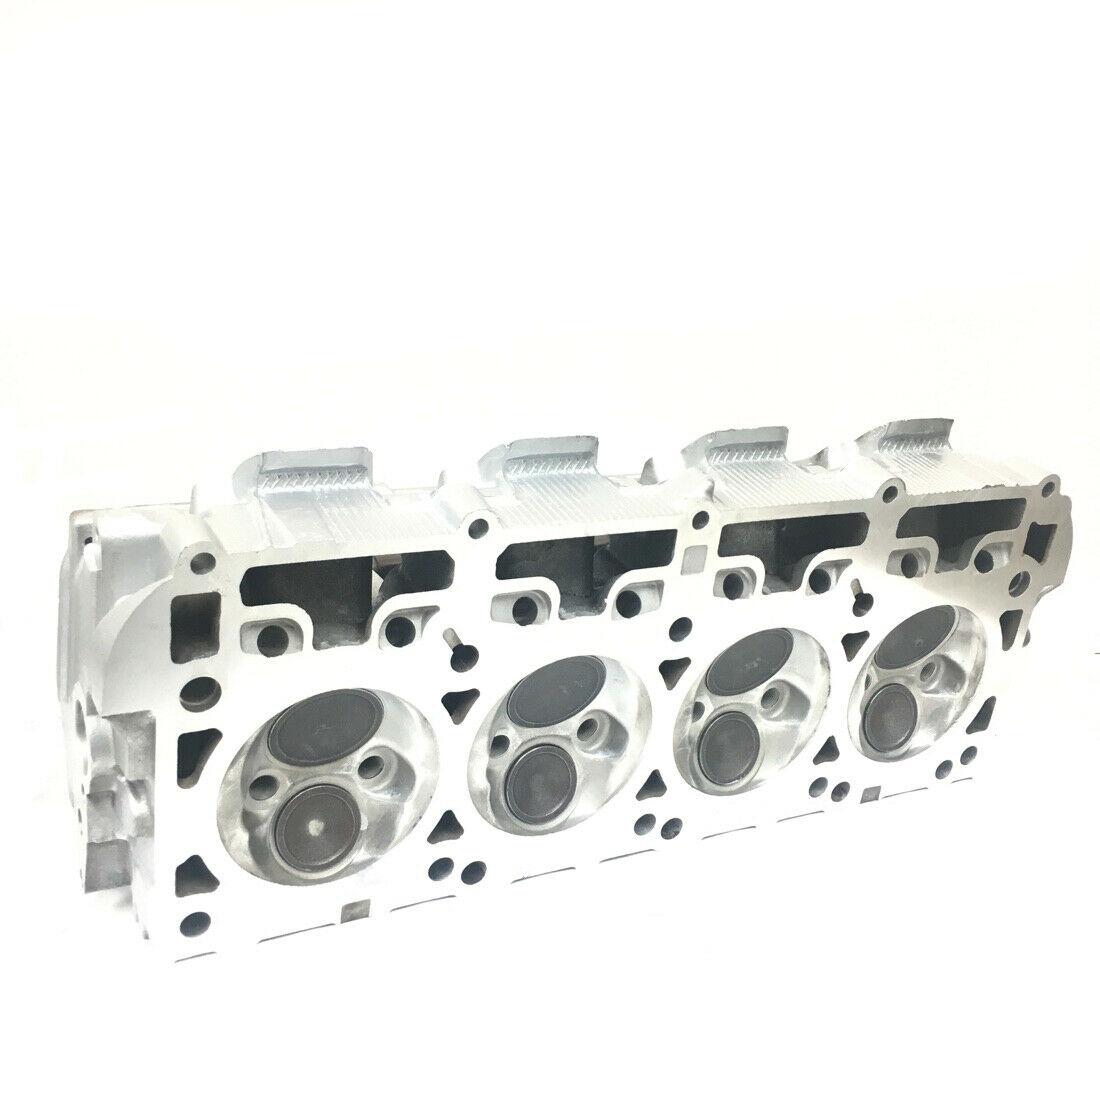 New Set of 2 Cylinder Head Gaskets Engine Driver /& Passenger Side LH RH 300 Pair